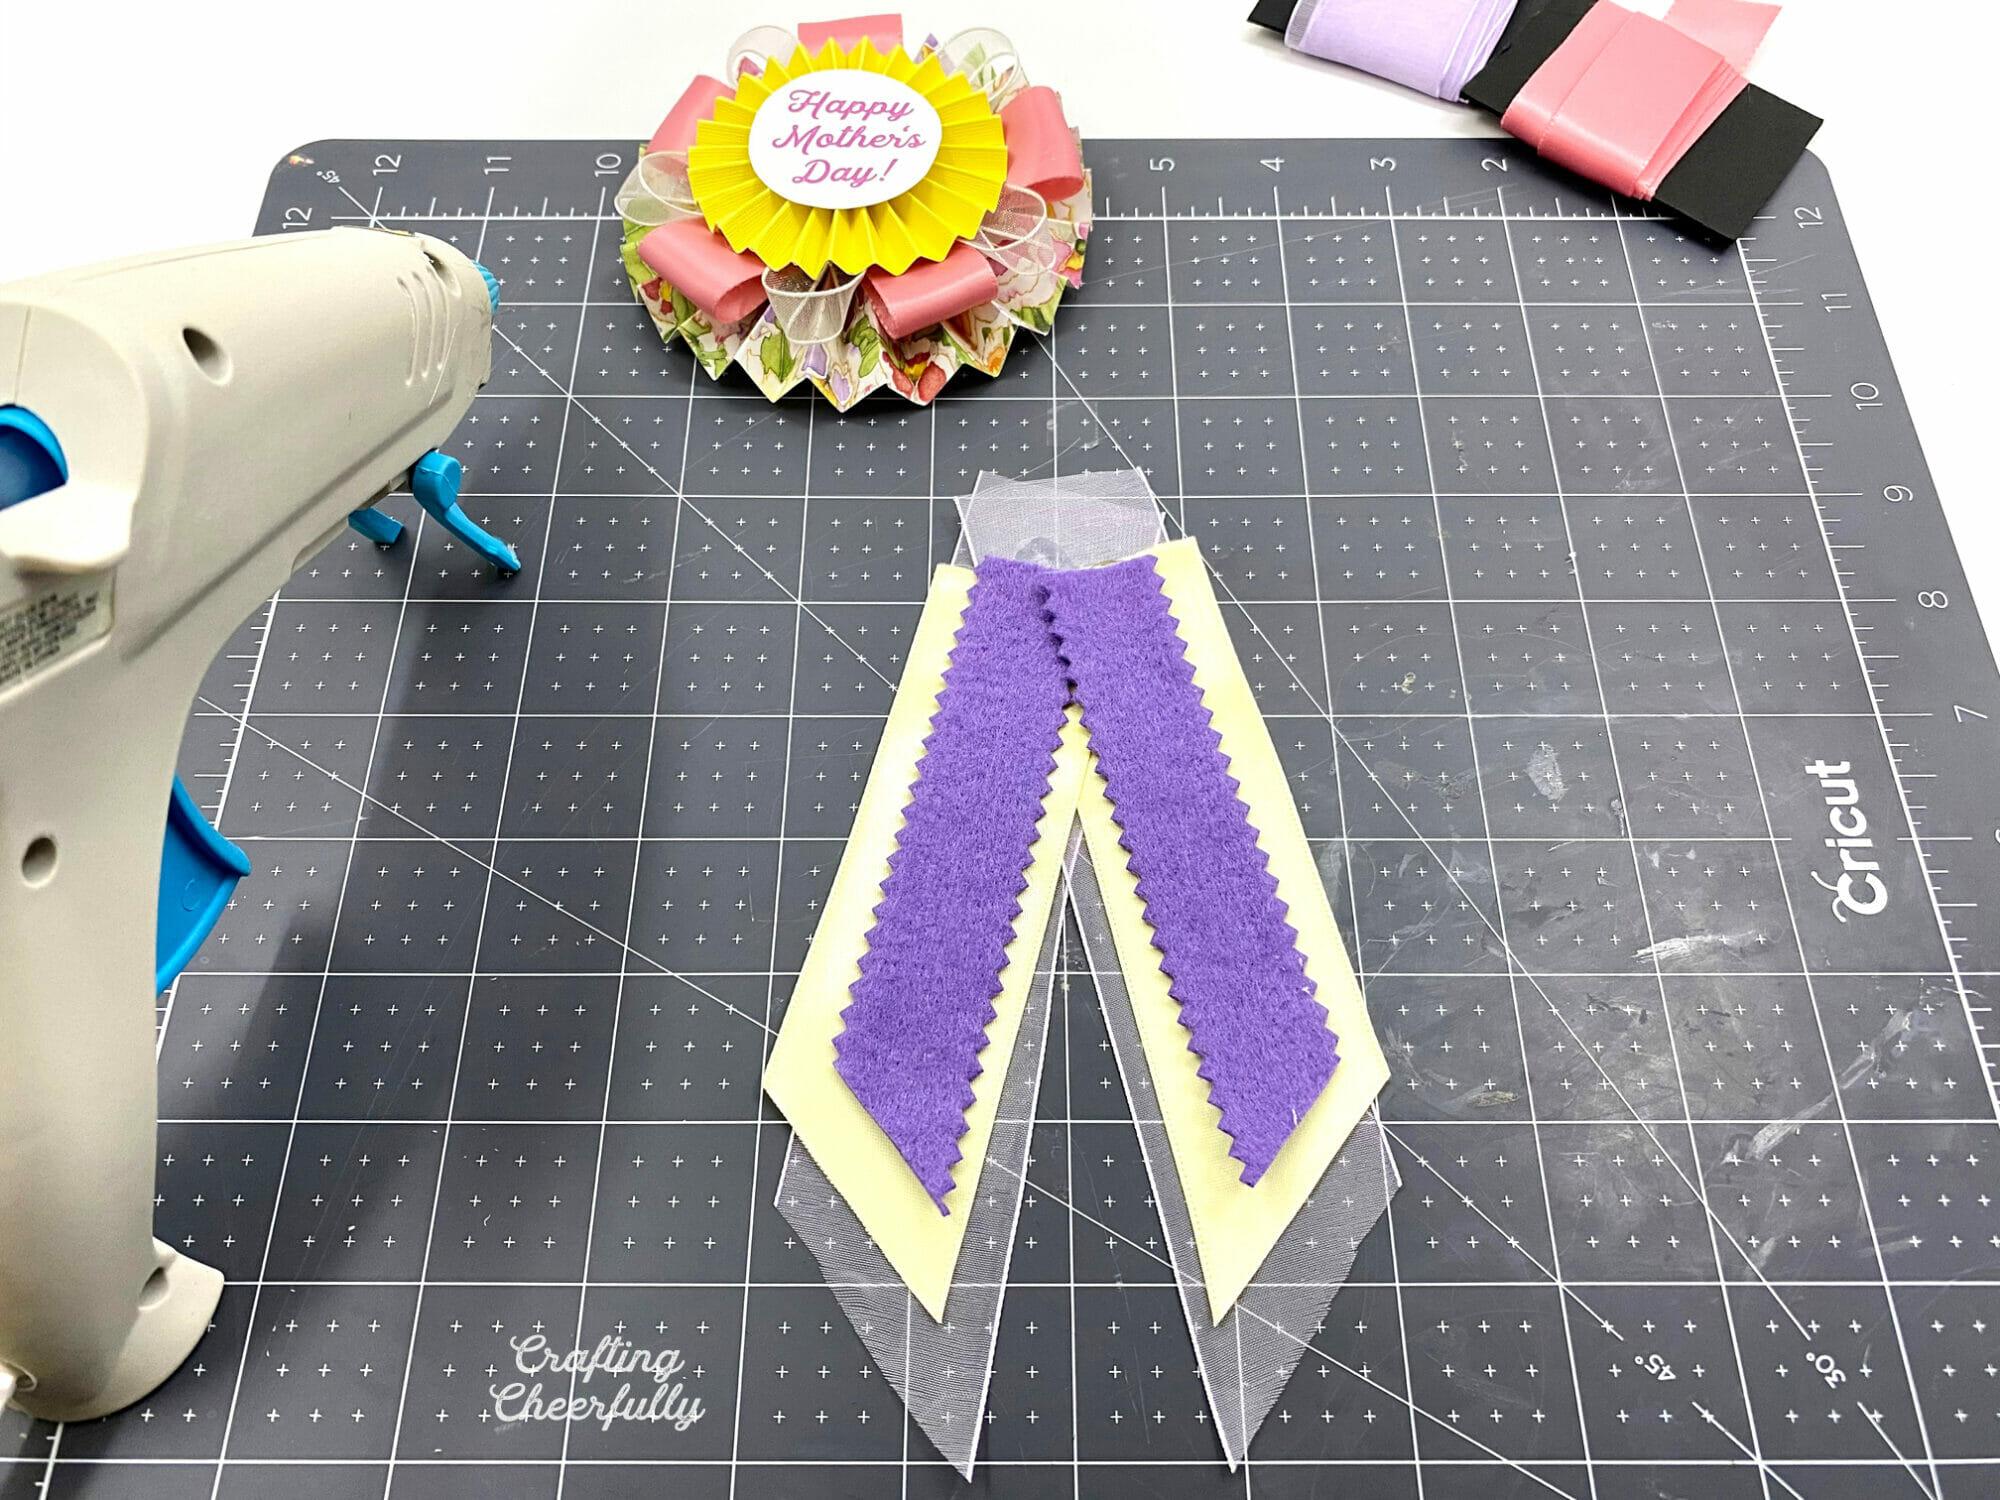 Ribbon lays on a black self-healing cutting mat with a glue gun.